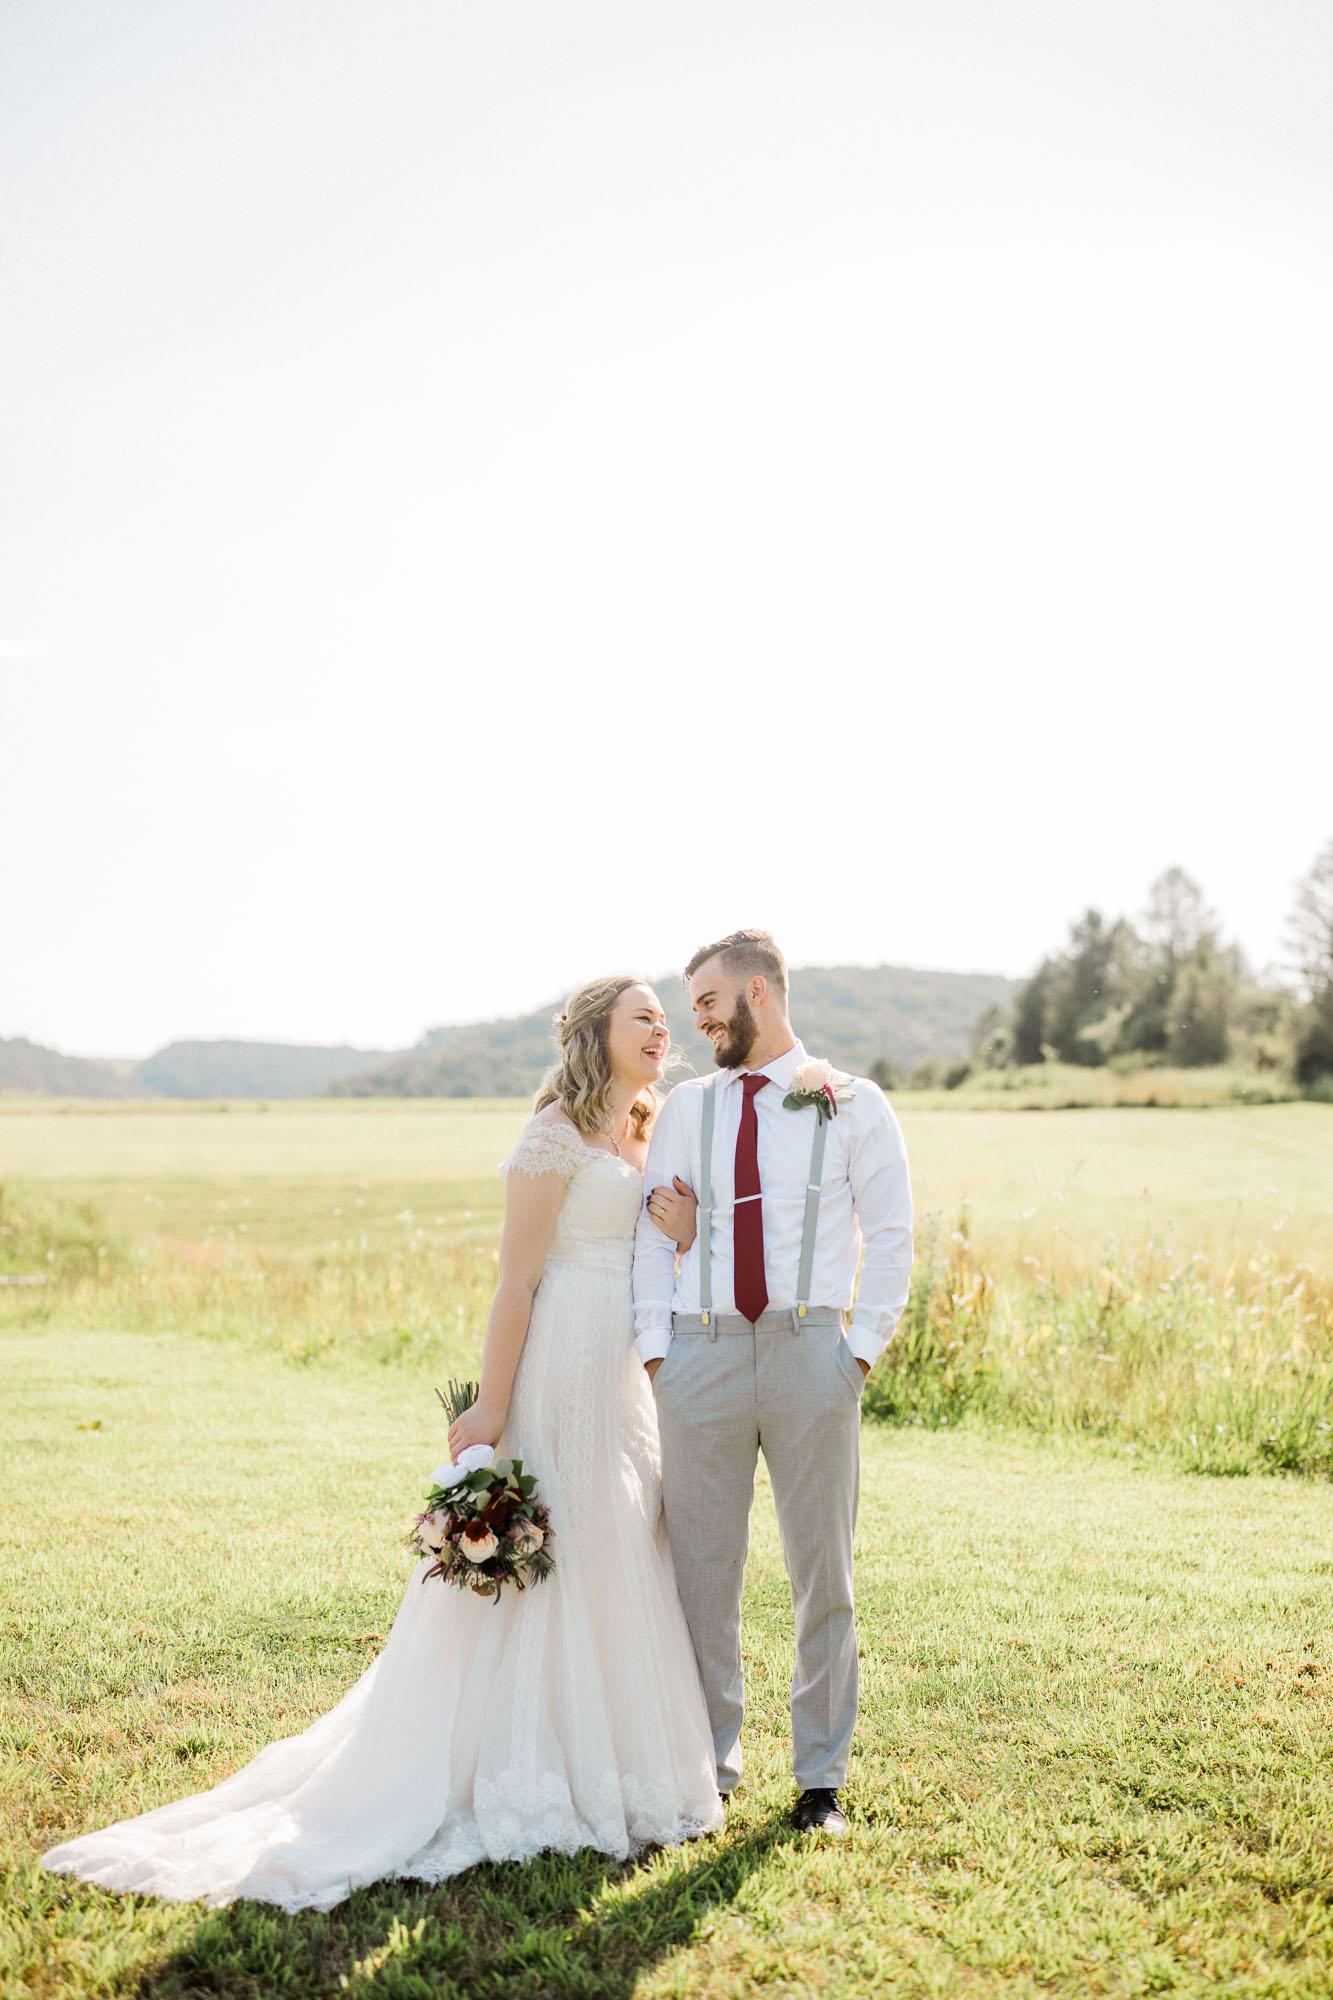 Stillwater-Christian_Church_Wedding-2050.jpg